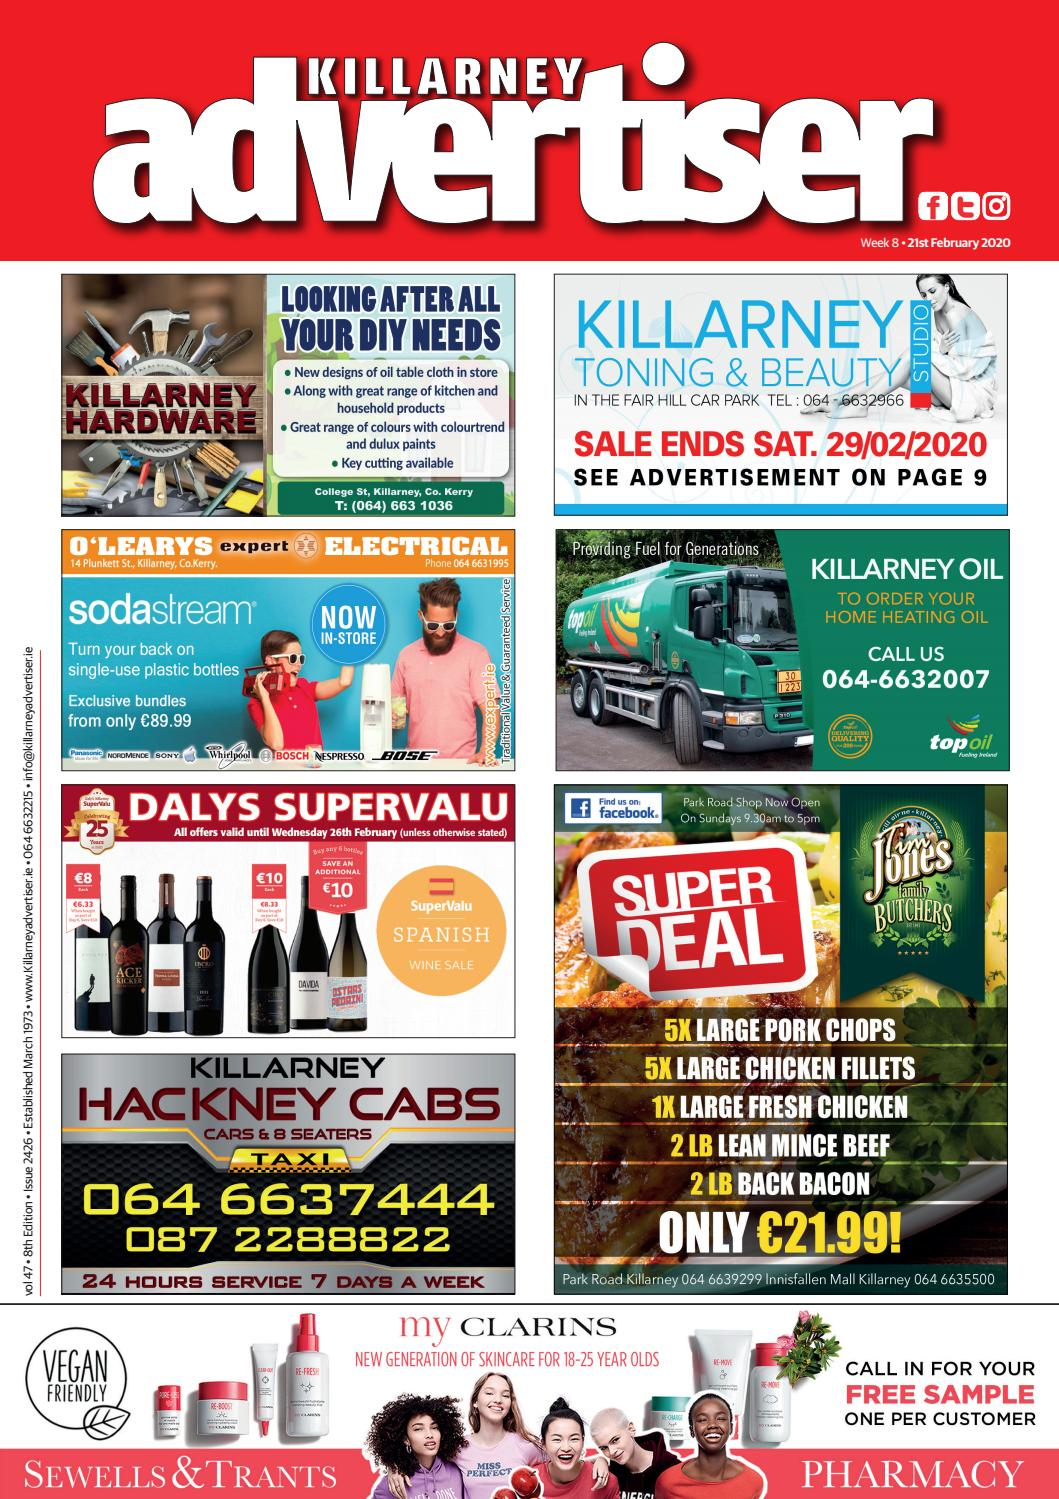 Killarney Advertiser 21St February 2020Killarney With Regard To Turning Stone Bingo Calendar For February 2020